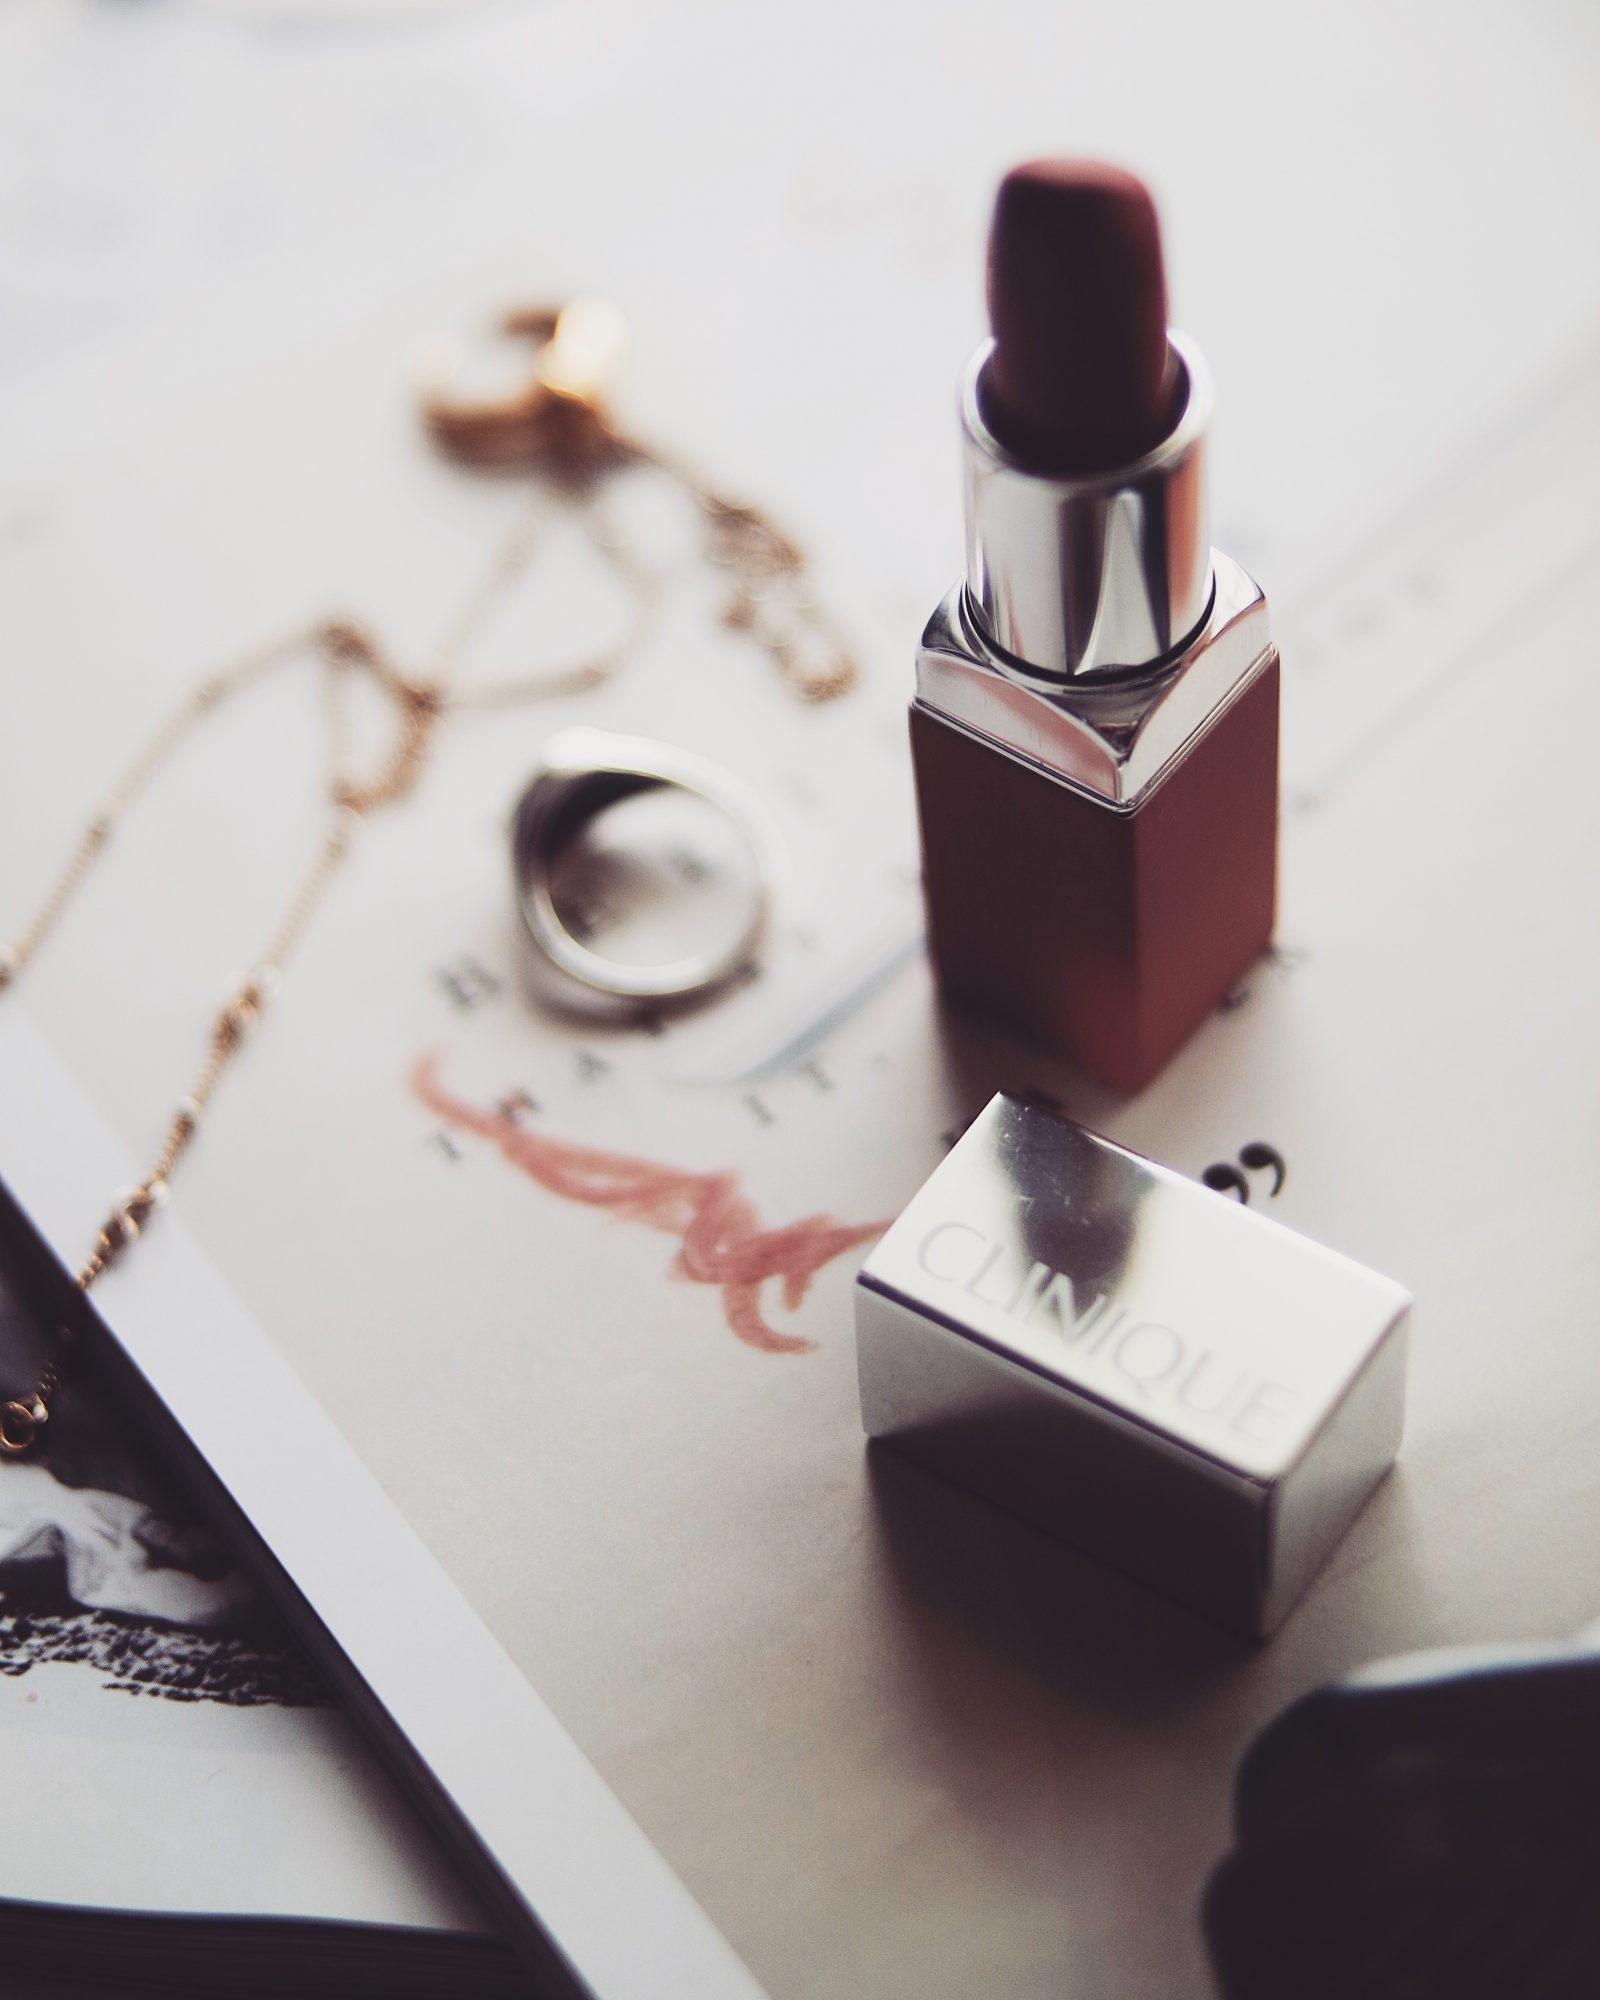 Nude Lipsticks - Clinique Colour Pop